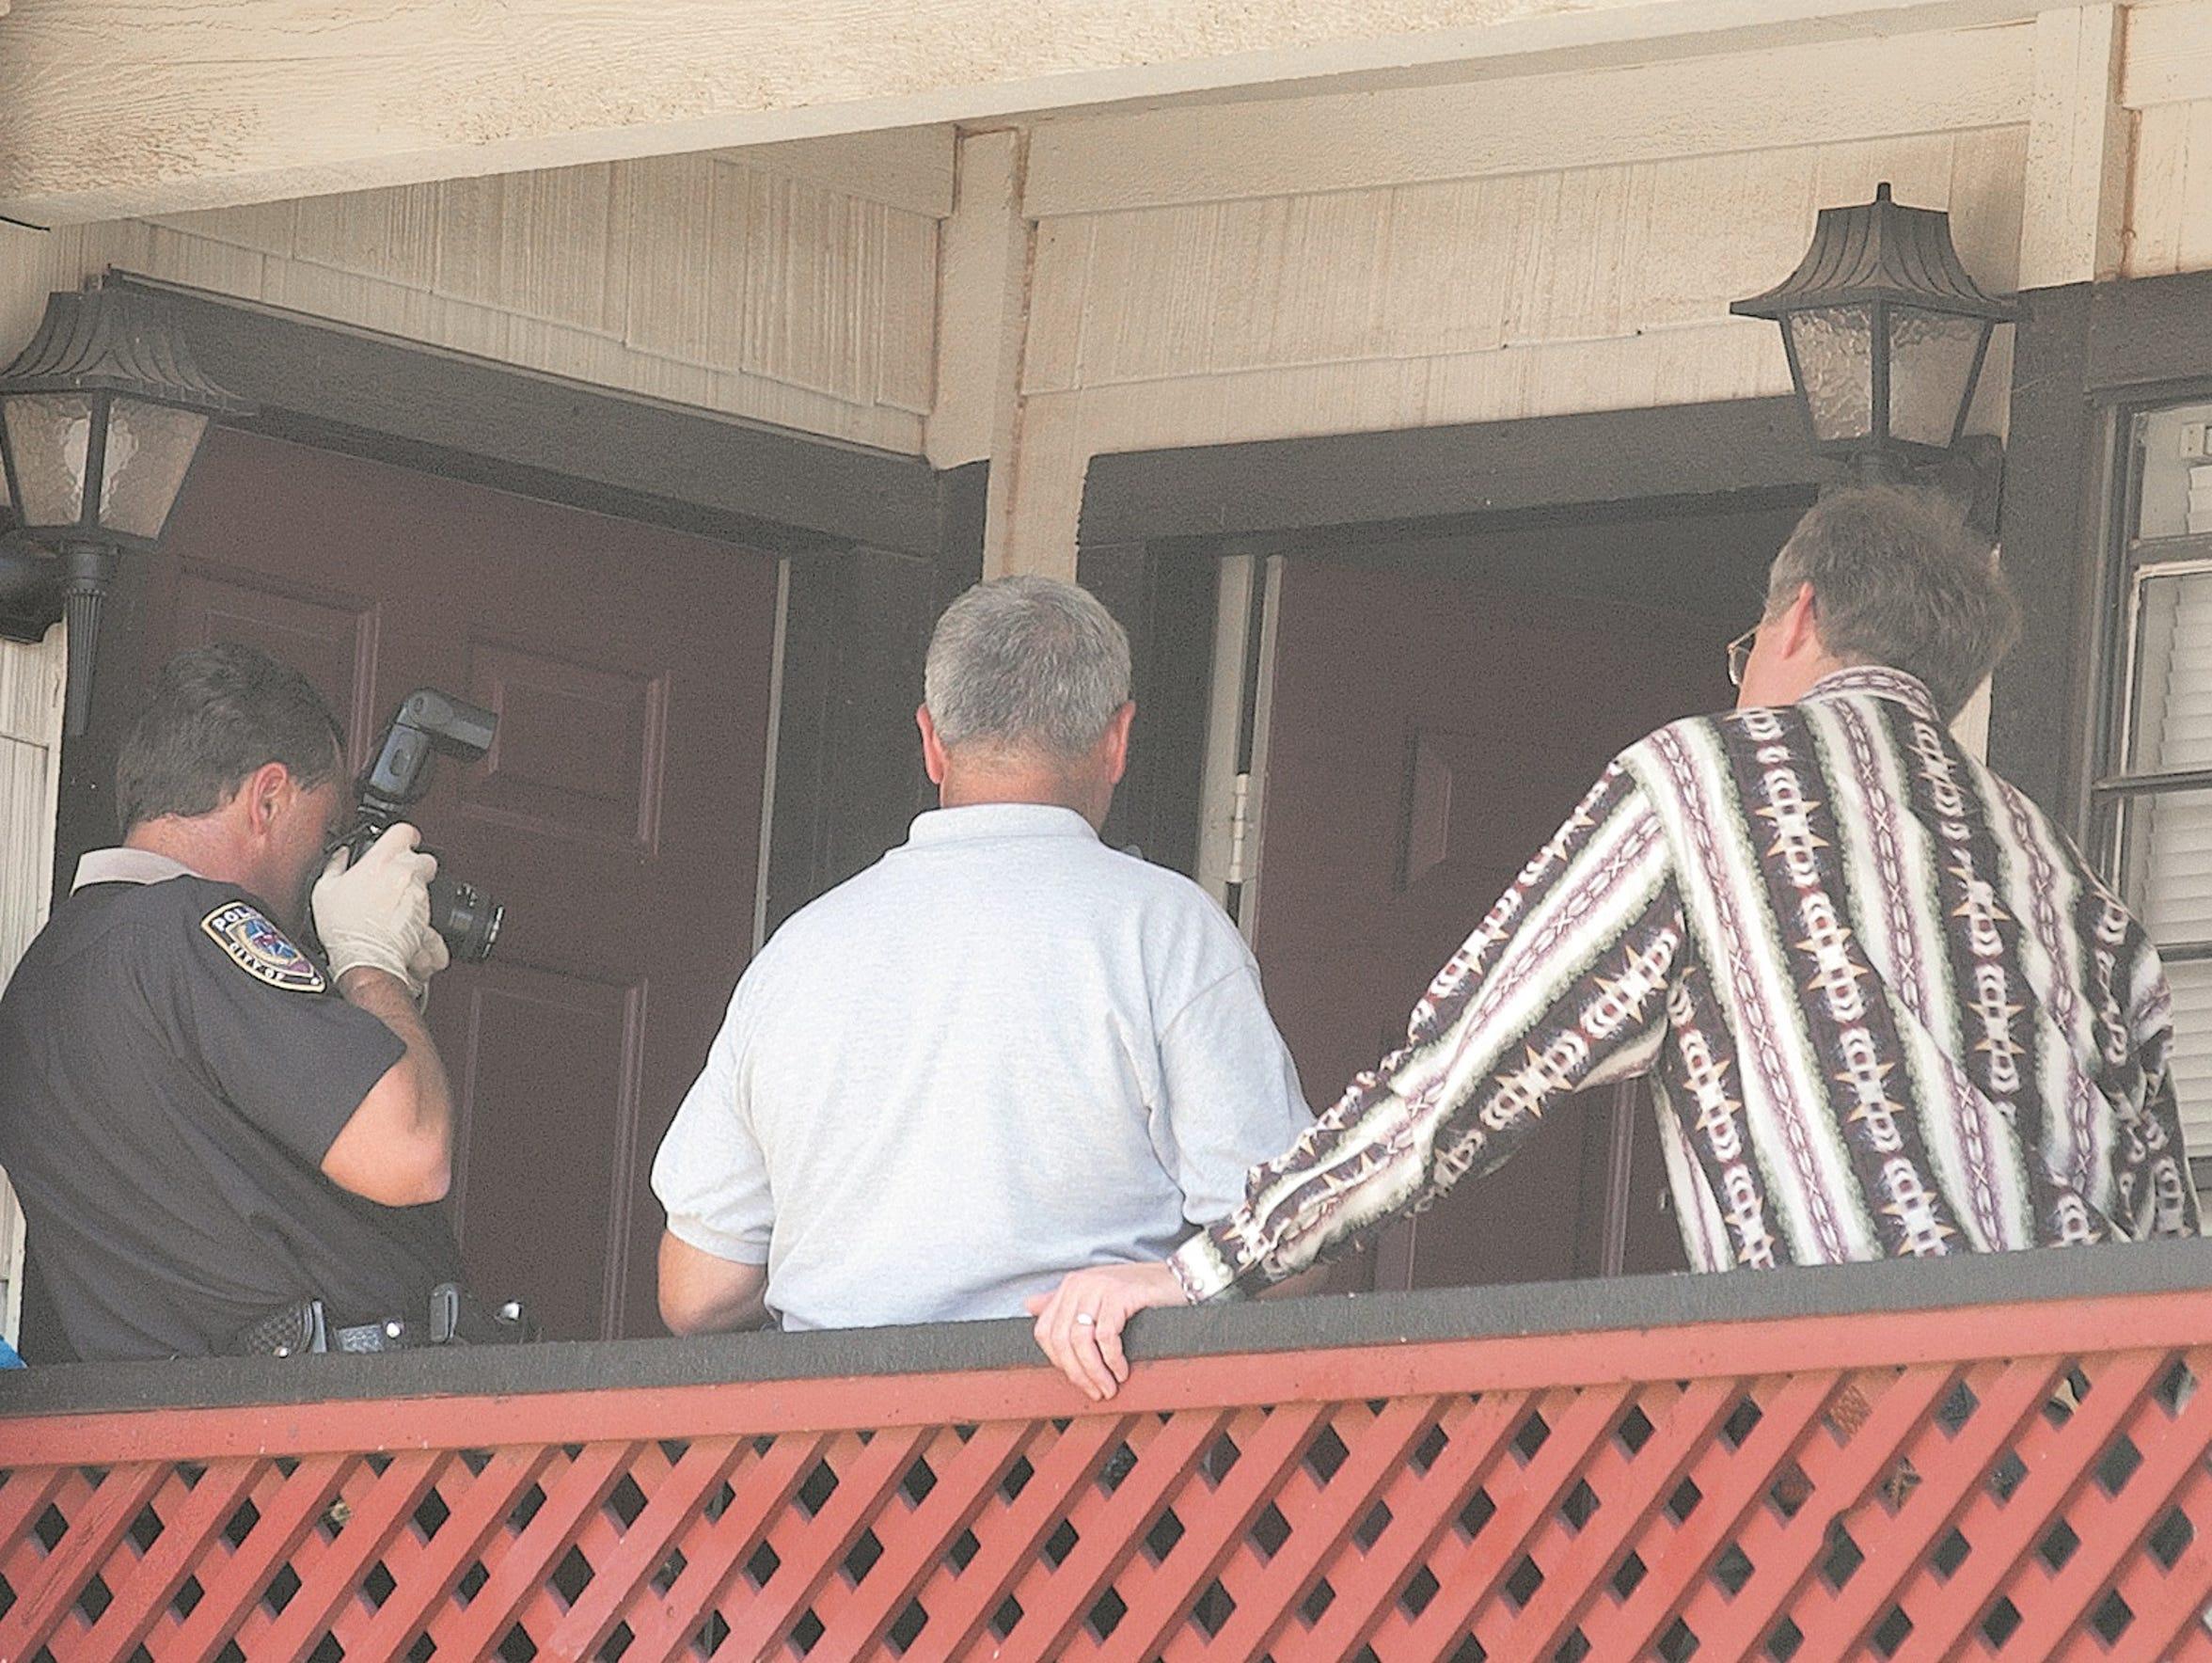 Abilene police take photos of the apartment where Jennifer